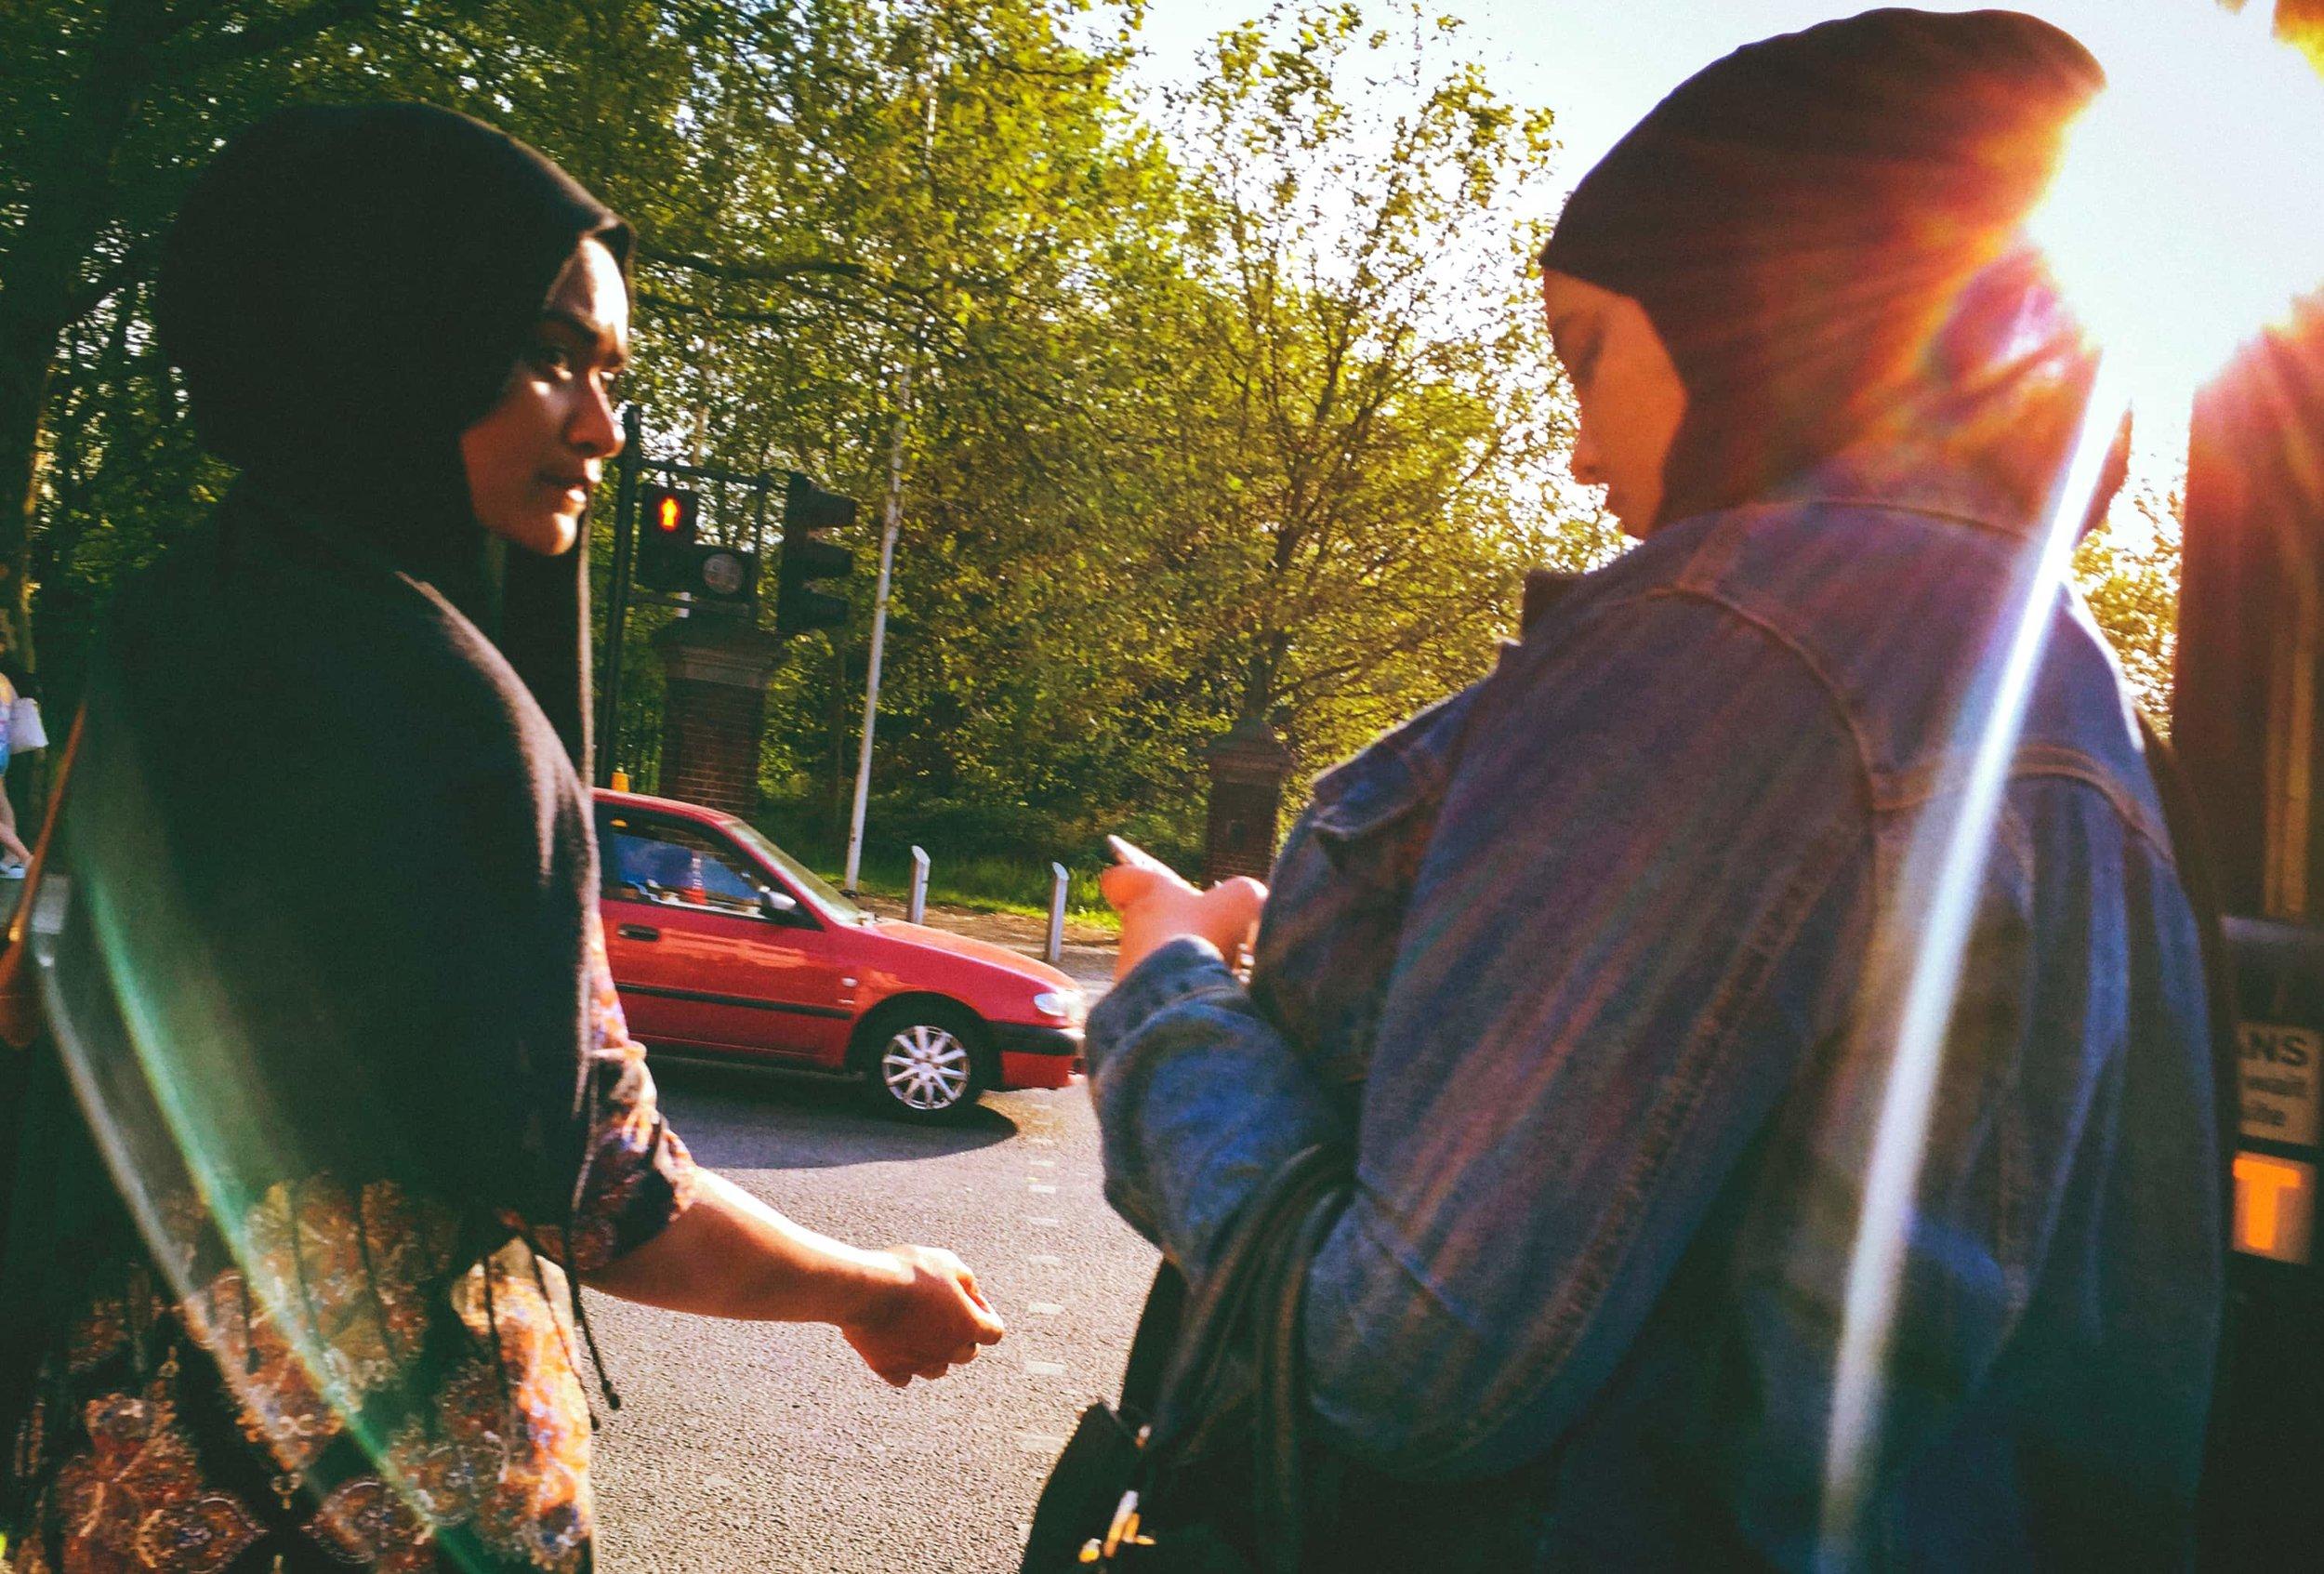 street-documentary-iphone-photography-fabio-burrelli-8.jpg